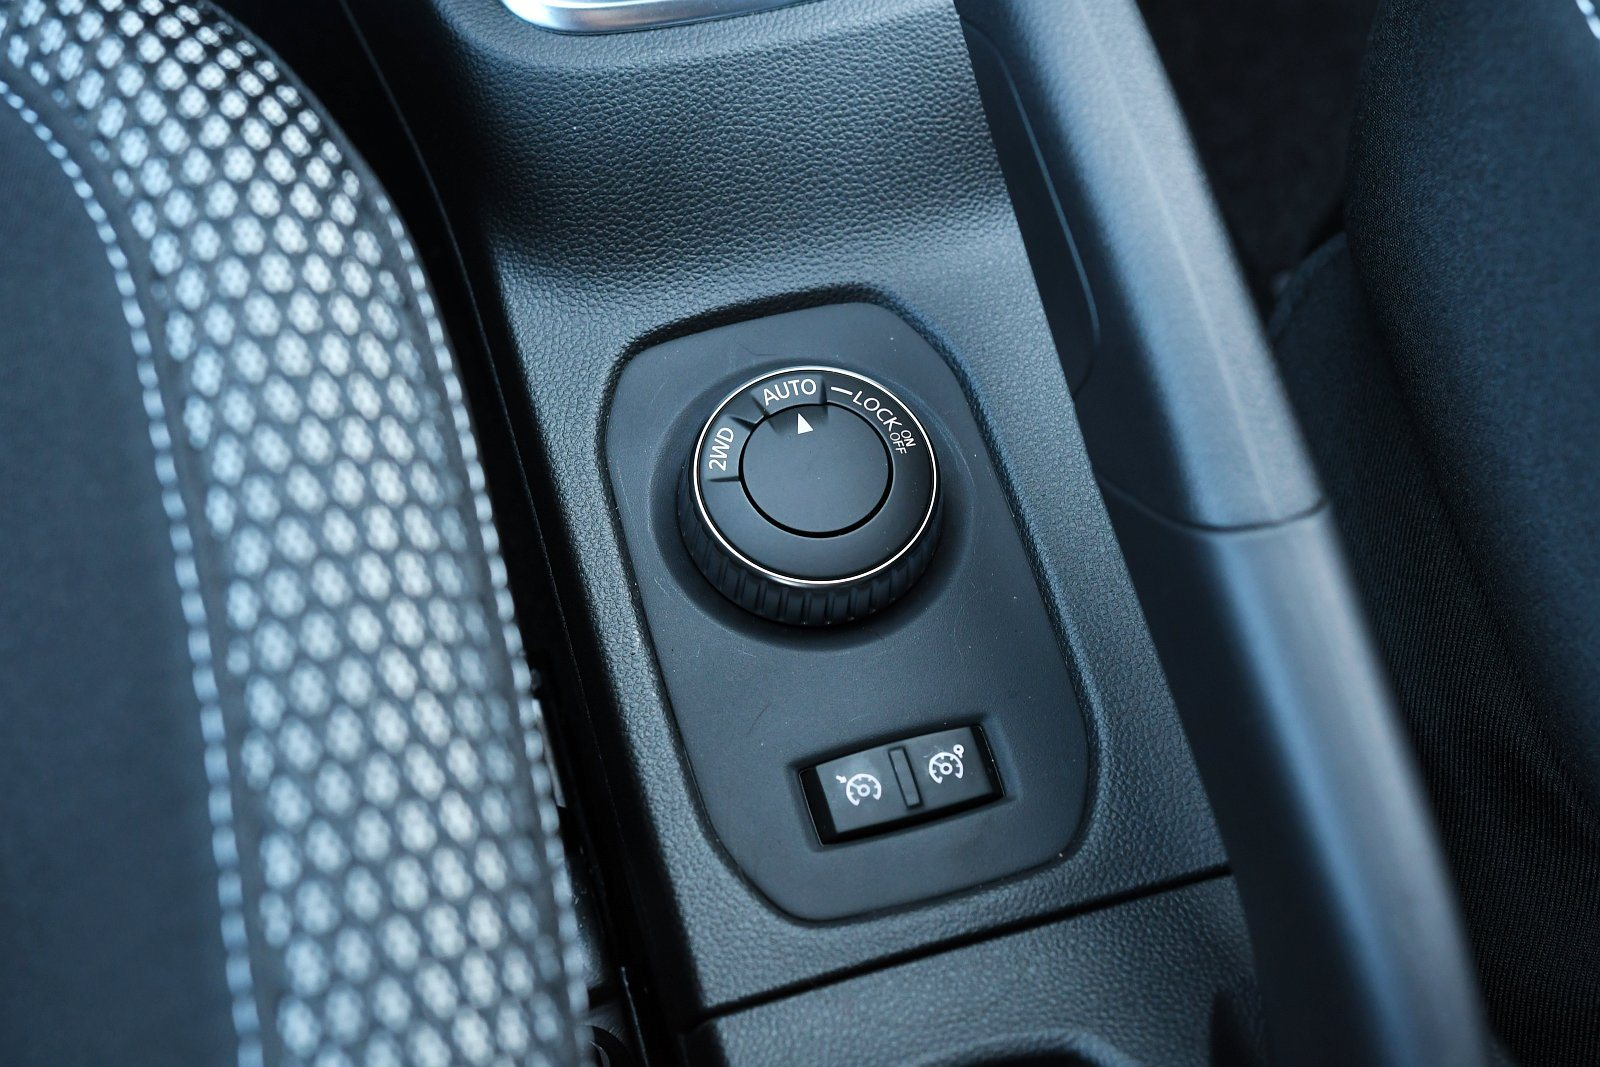 Dacia Duster 1.3 TCe 150 4WD test 2020 napęd 4x4